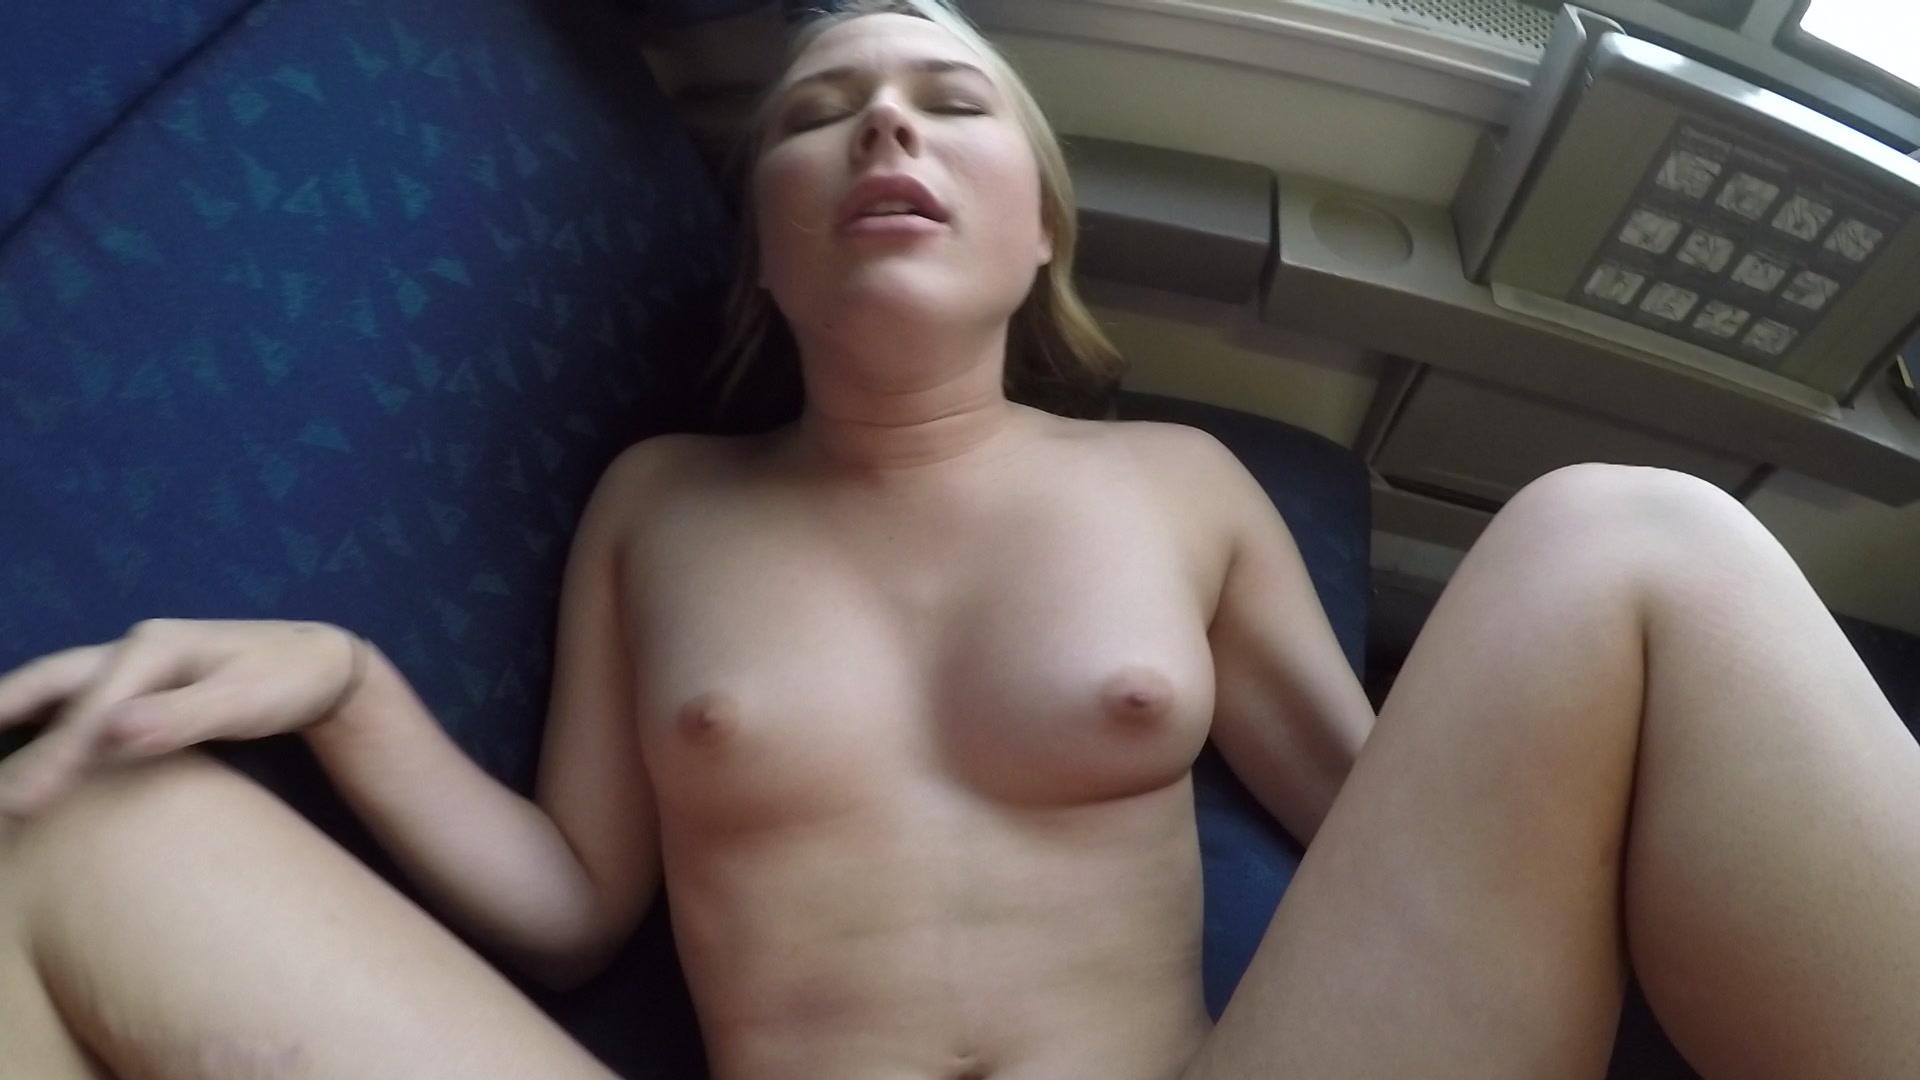 Sex On Trains Streaming eller Download video On Demand-1234